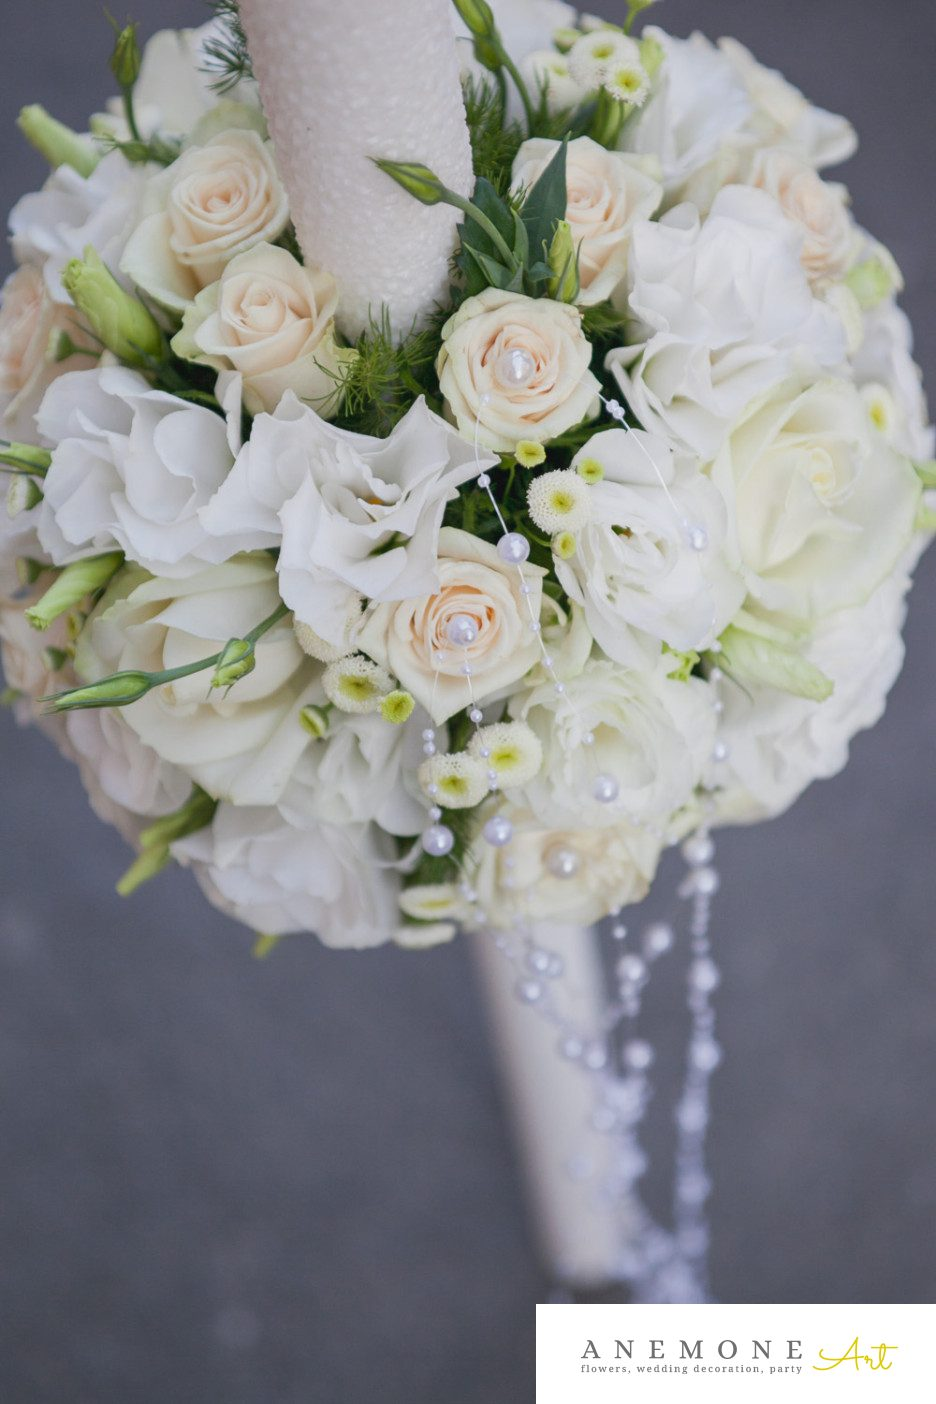 Poza, foto cu Flori de nunta alb, crem, lisianthus, lumanare, matricaria eximia, perle, trandafiri in Arad, Timisoara, Oradea (wedding flowers, bouquets) nunta Arad, Timisoara, Oradea